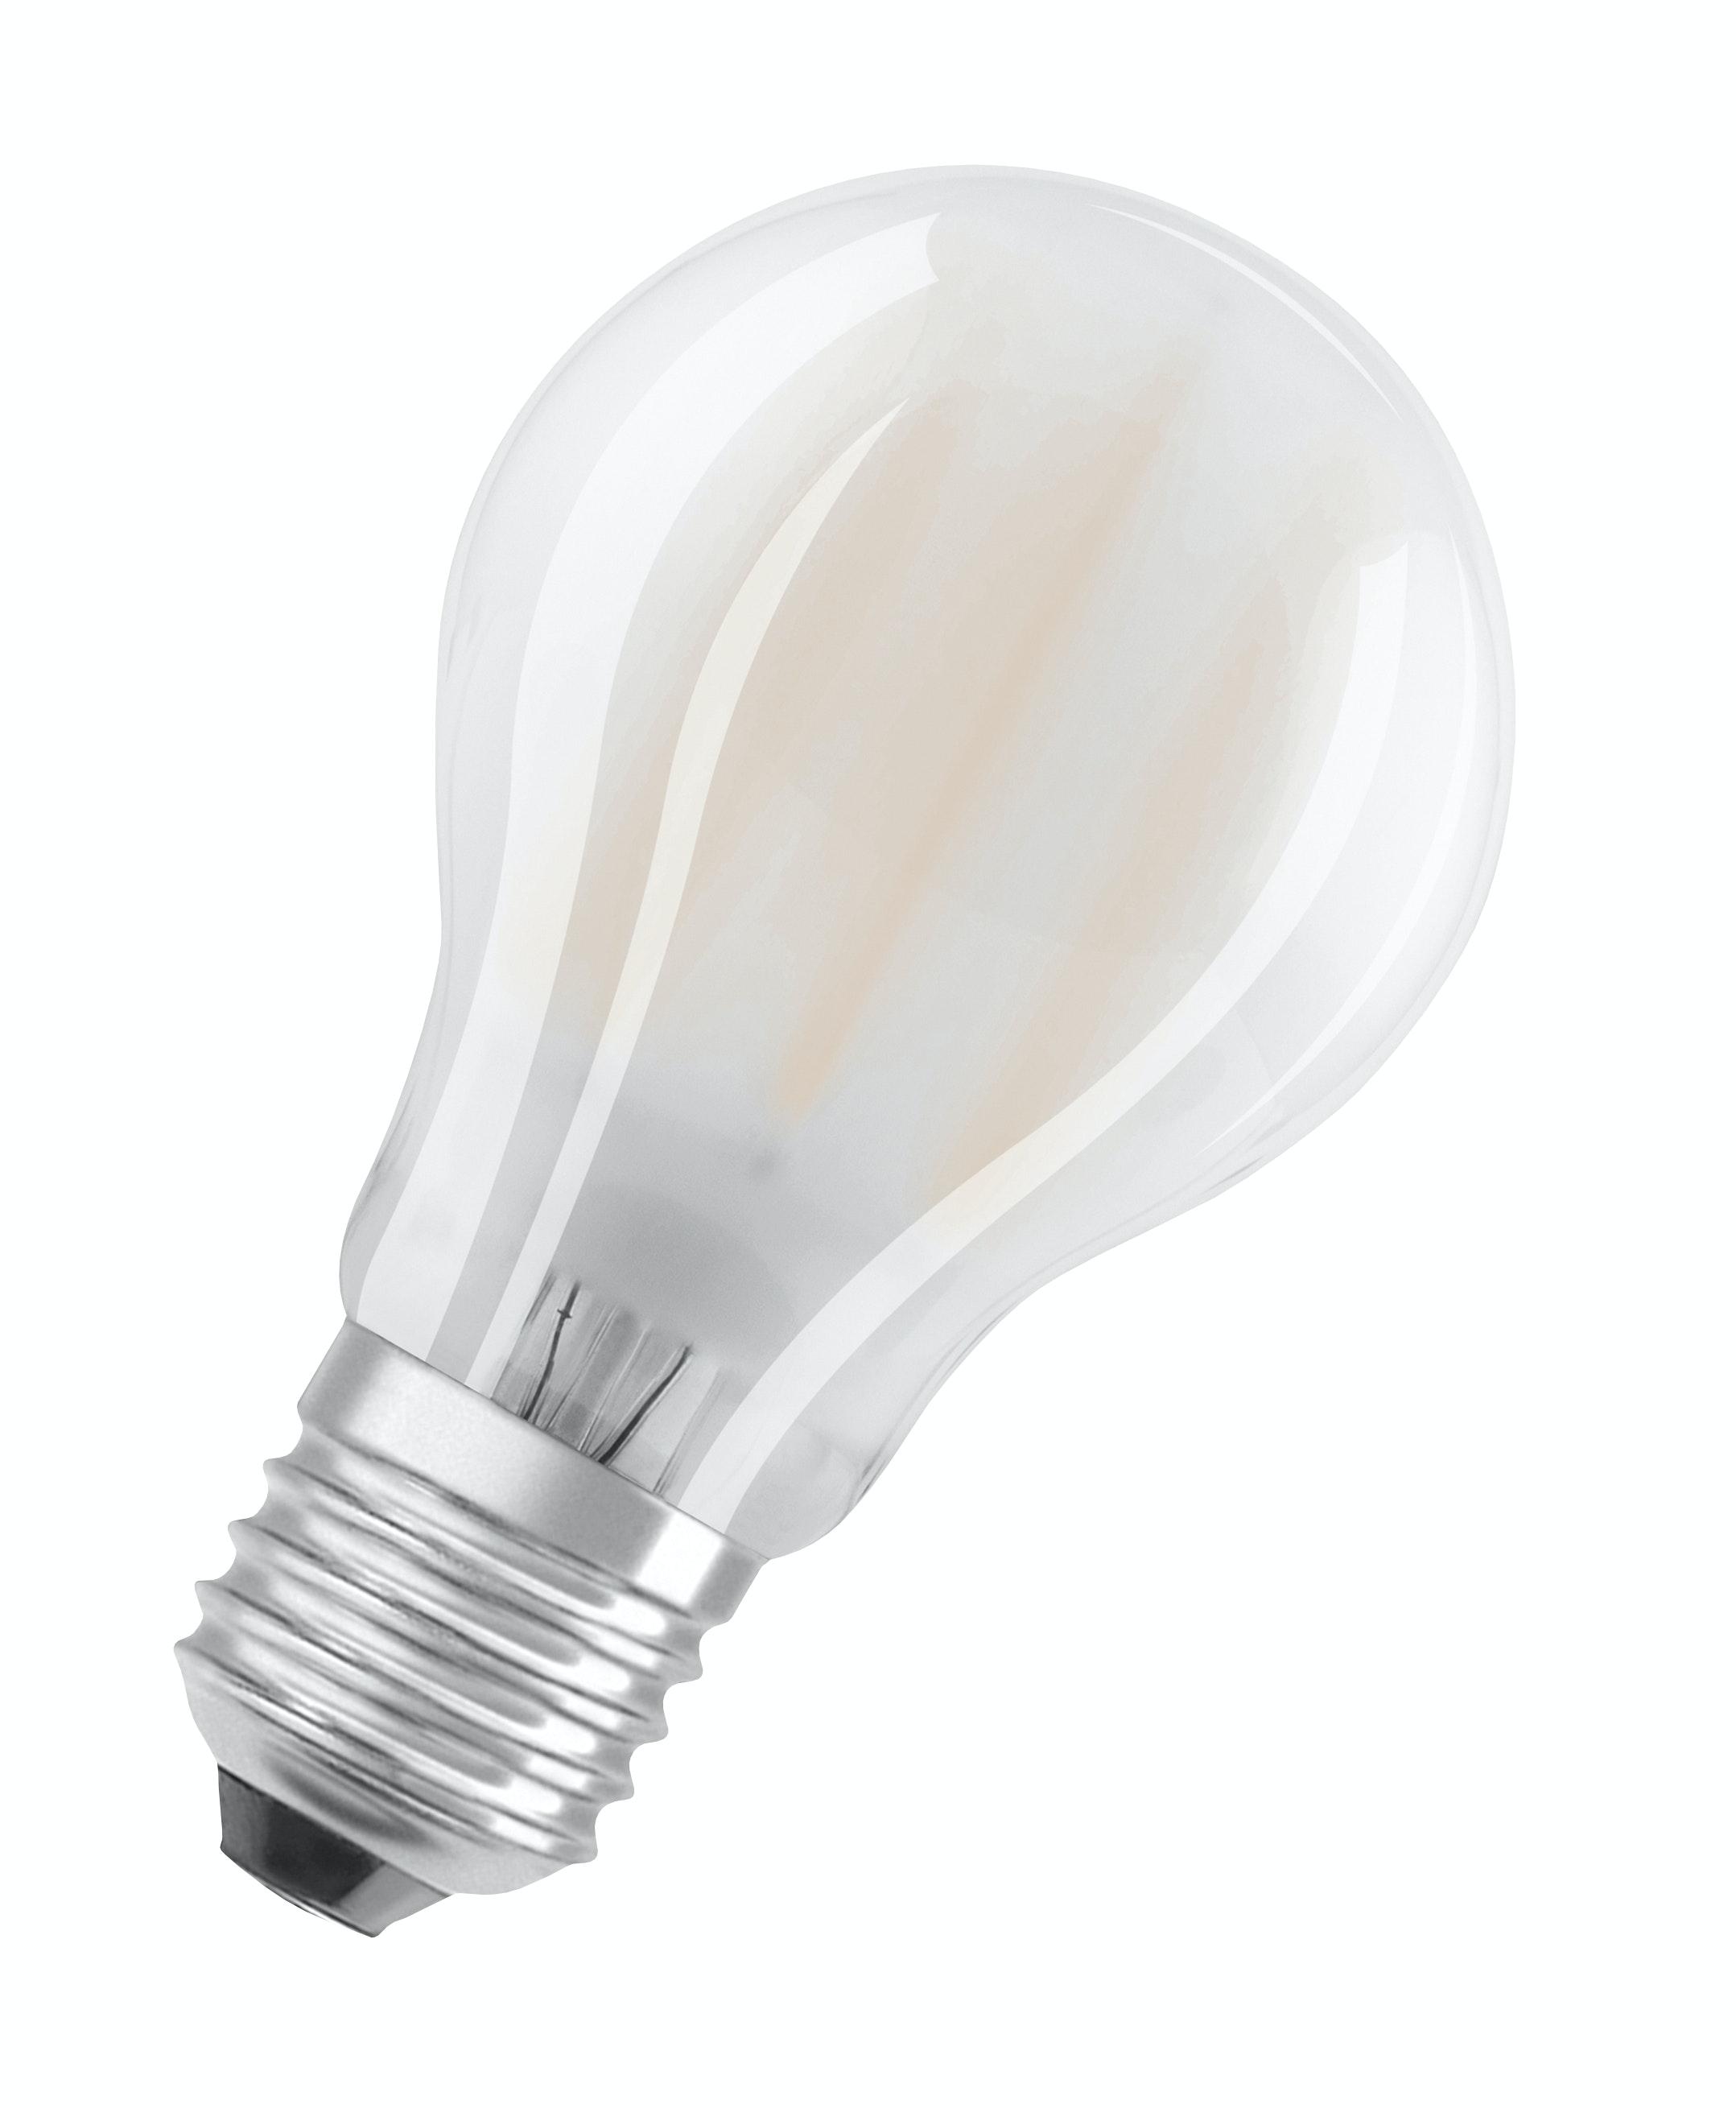 LED-Lampa Osram Retrofit E27 Filament 7W Klot Matt